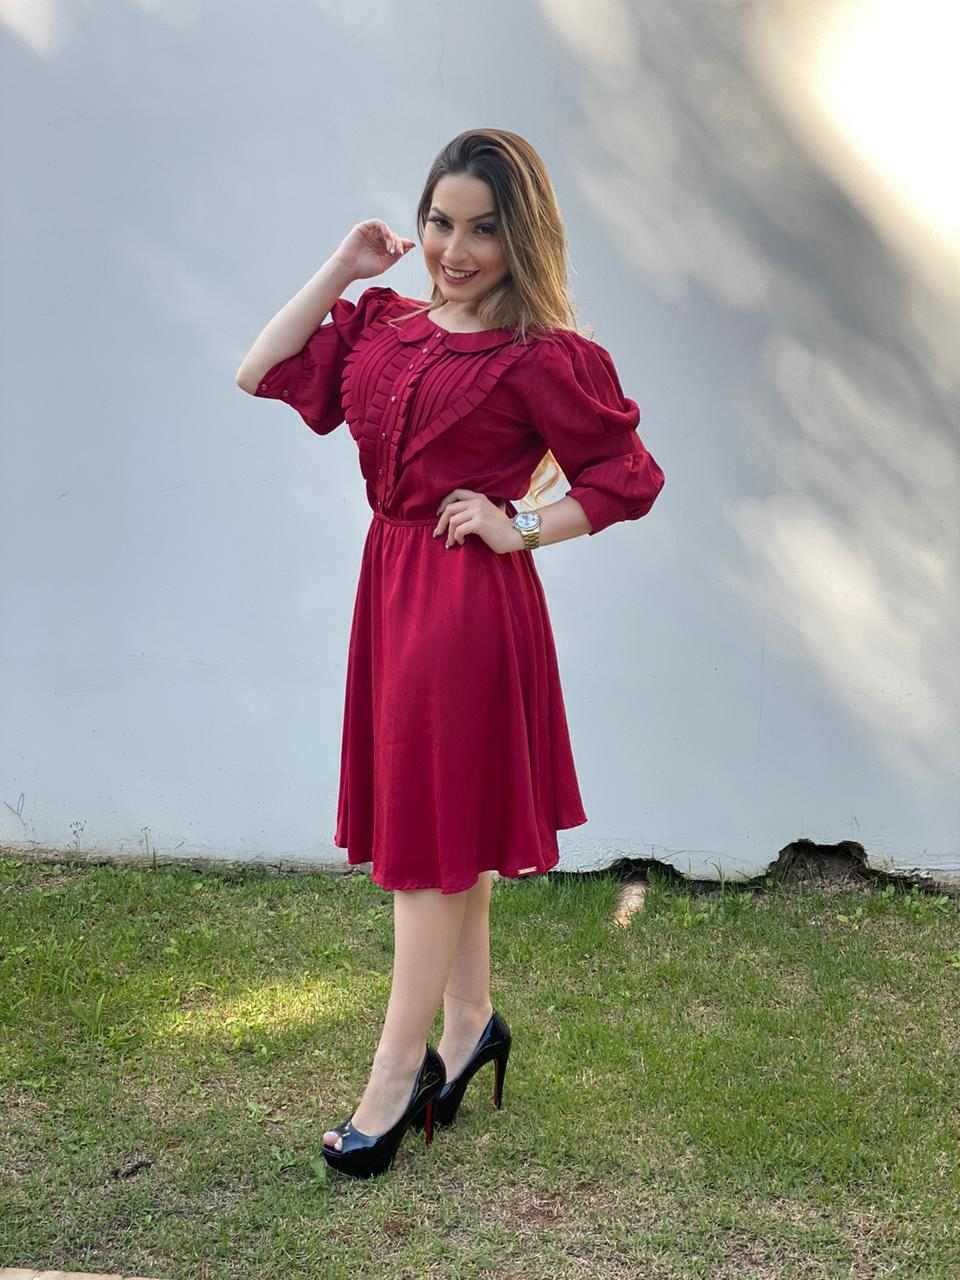 VESTIDO LADY LIKE MANGA LONGA - DAZUL MODA FEMININA EVANGÉLICA